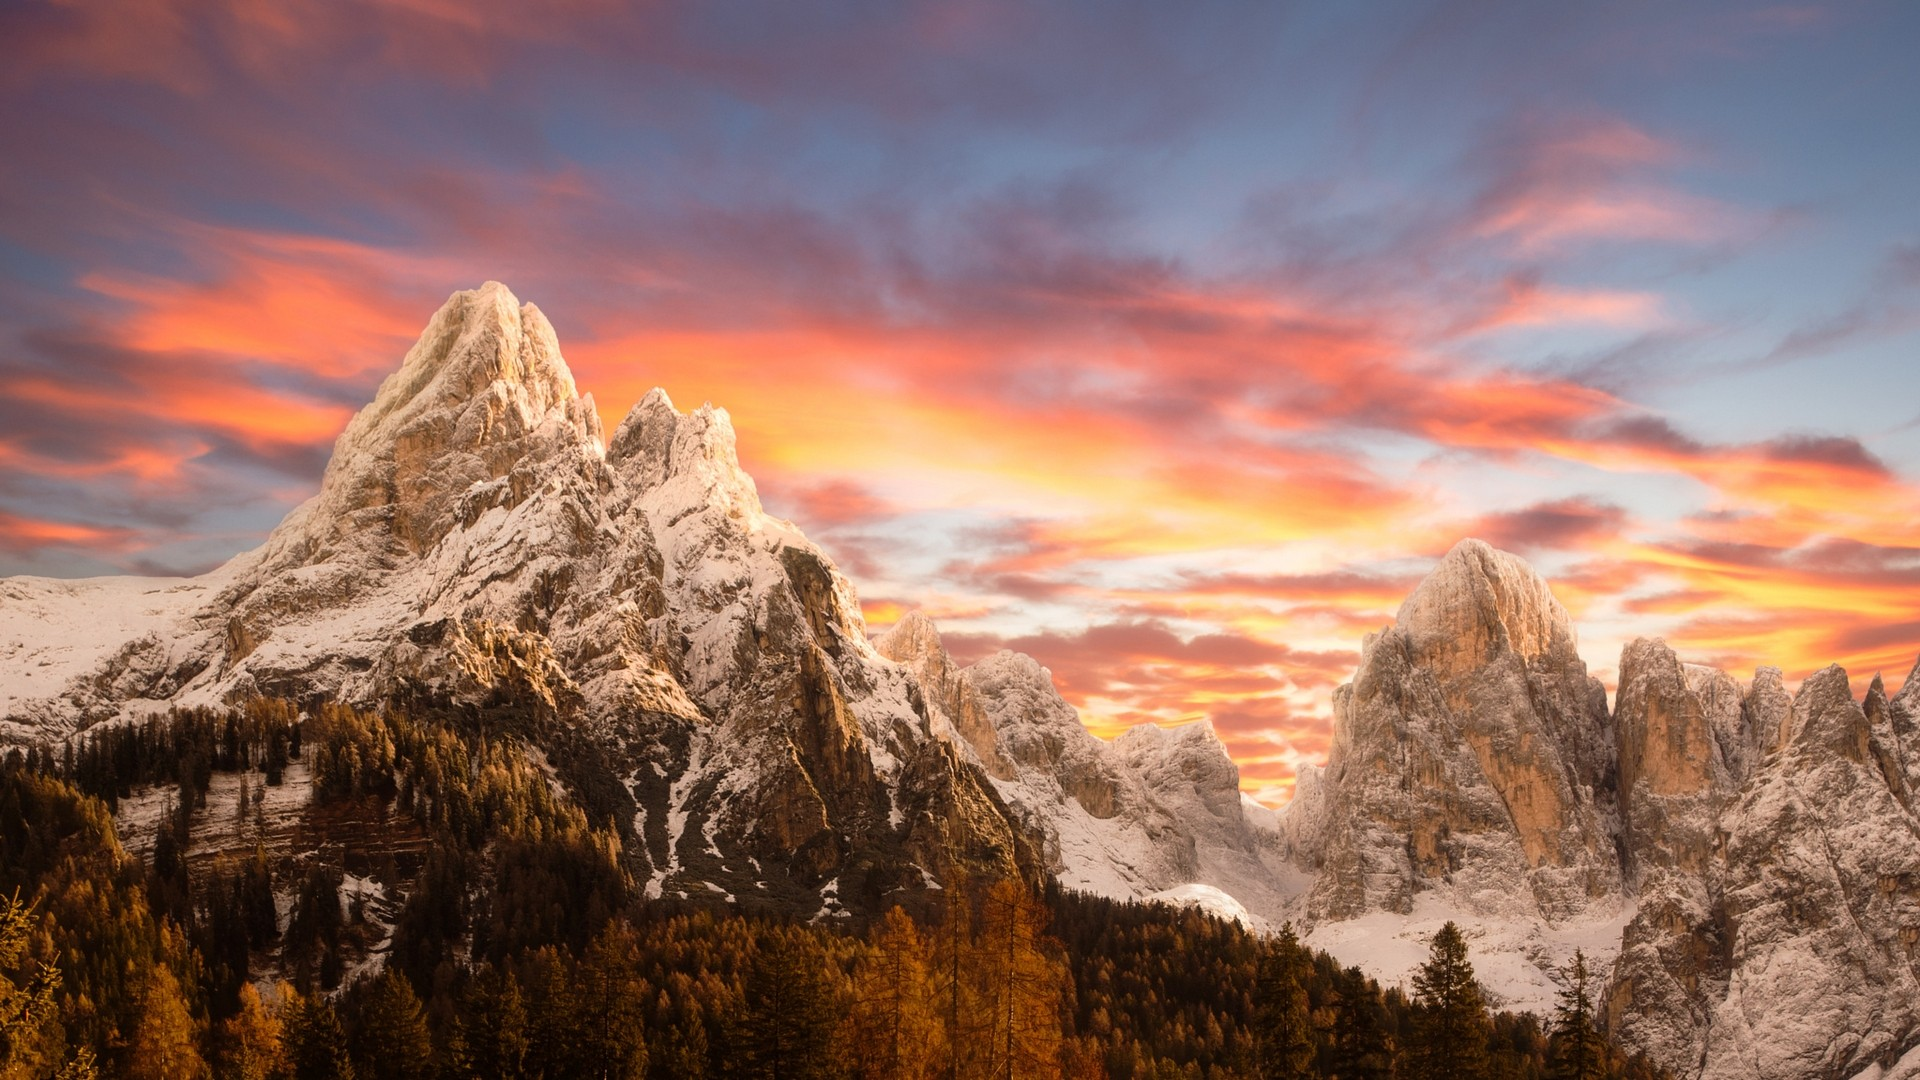 Beautiful Wallpaper Mountain Nokia - dolomites-mountains  Image_175046.jpg